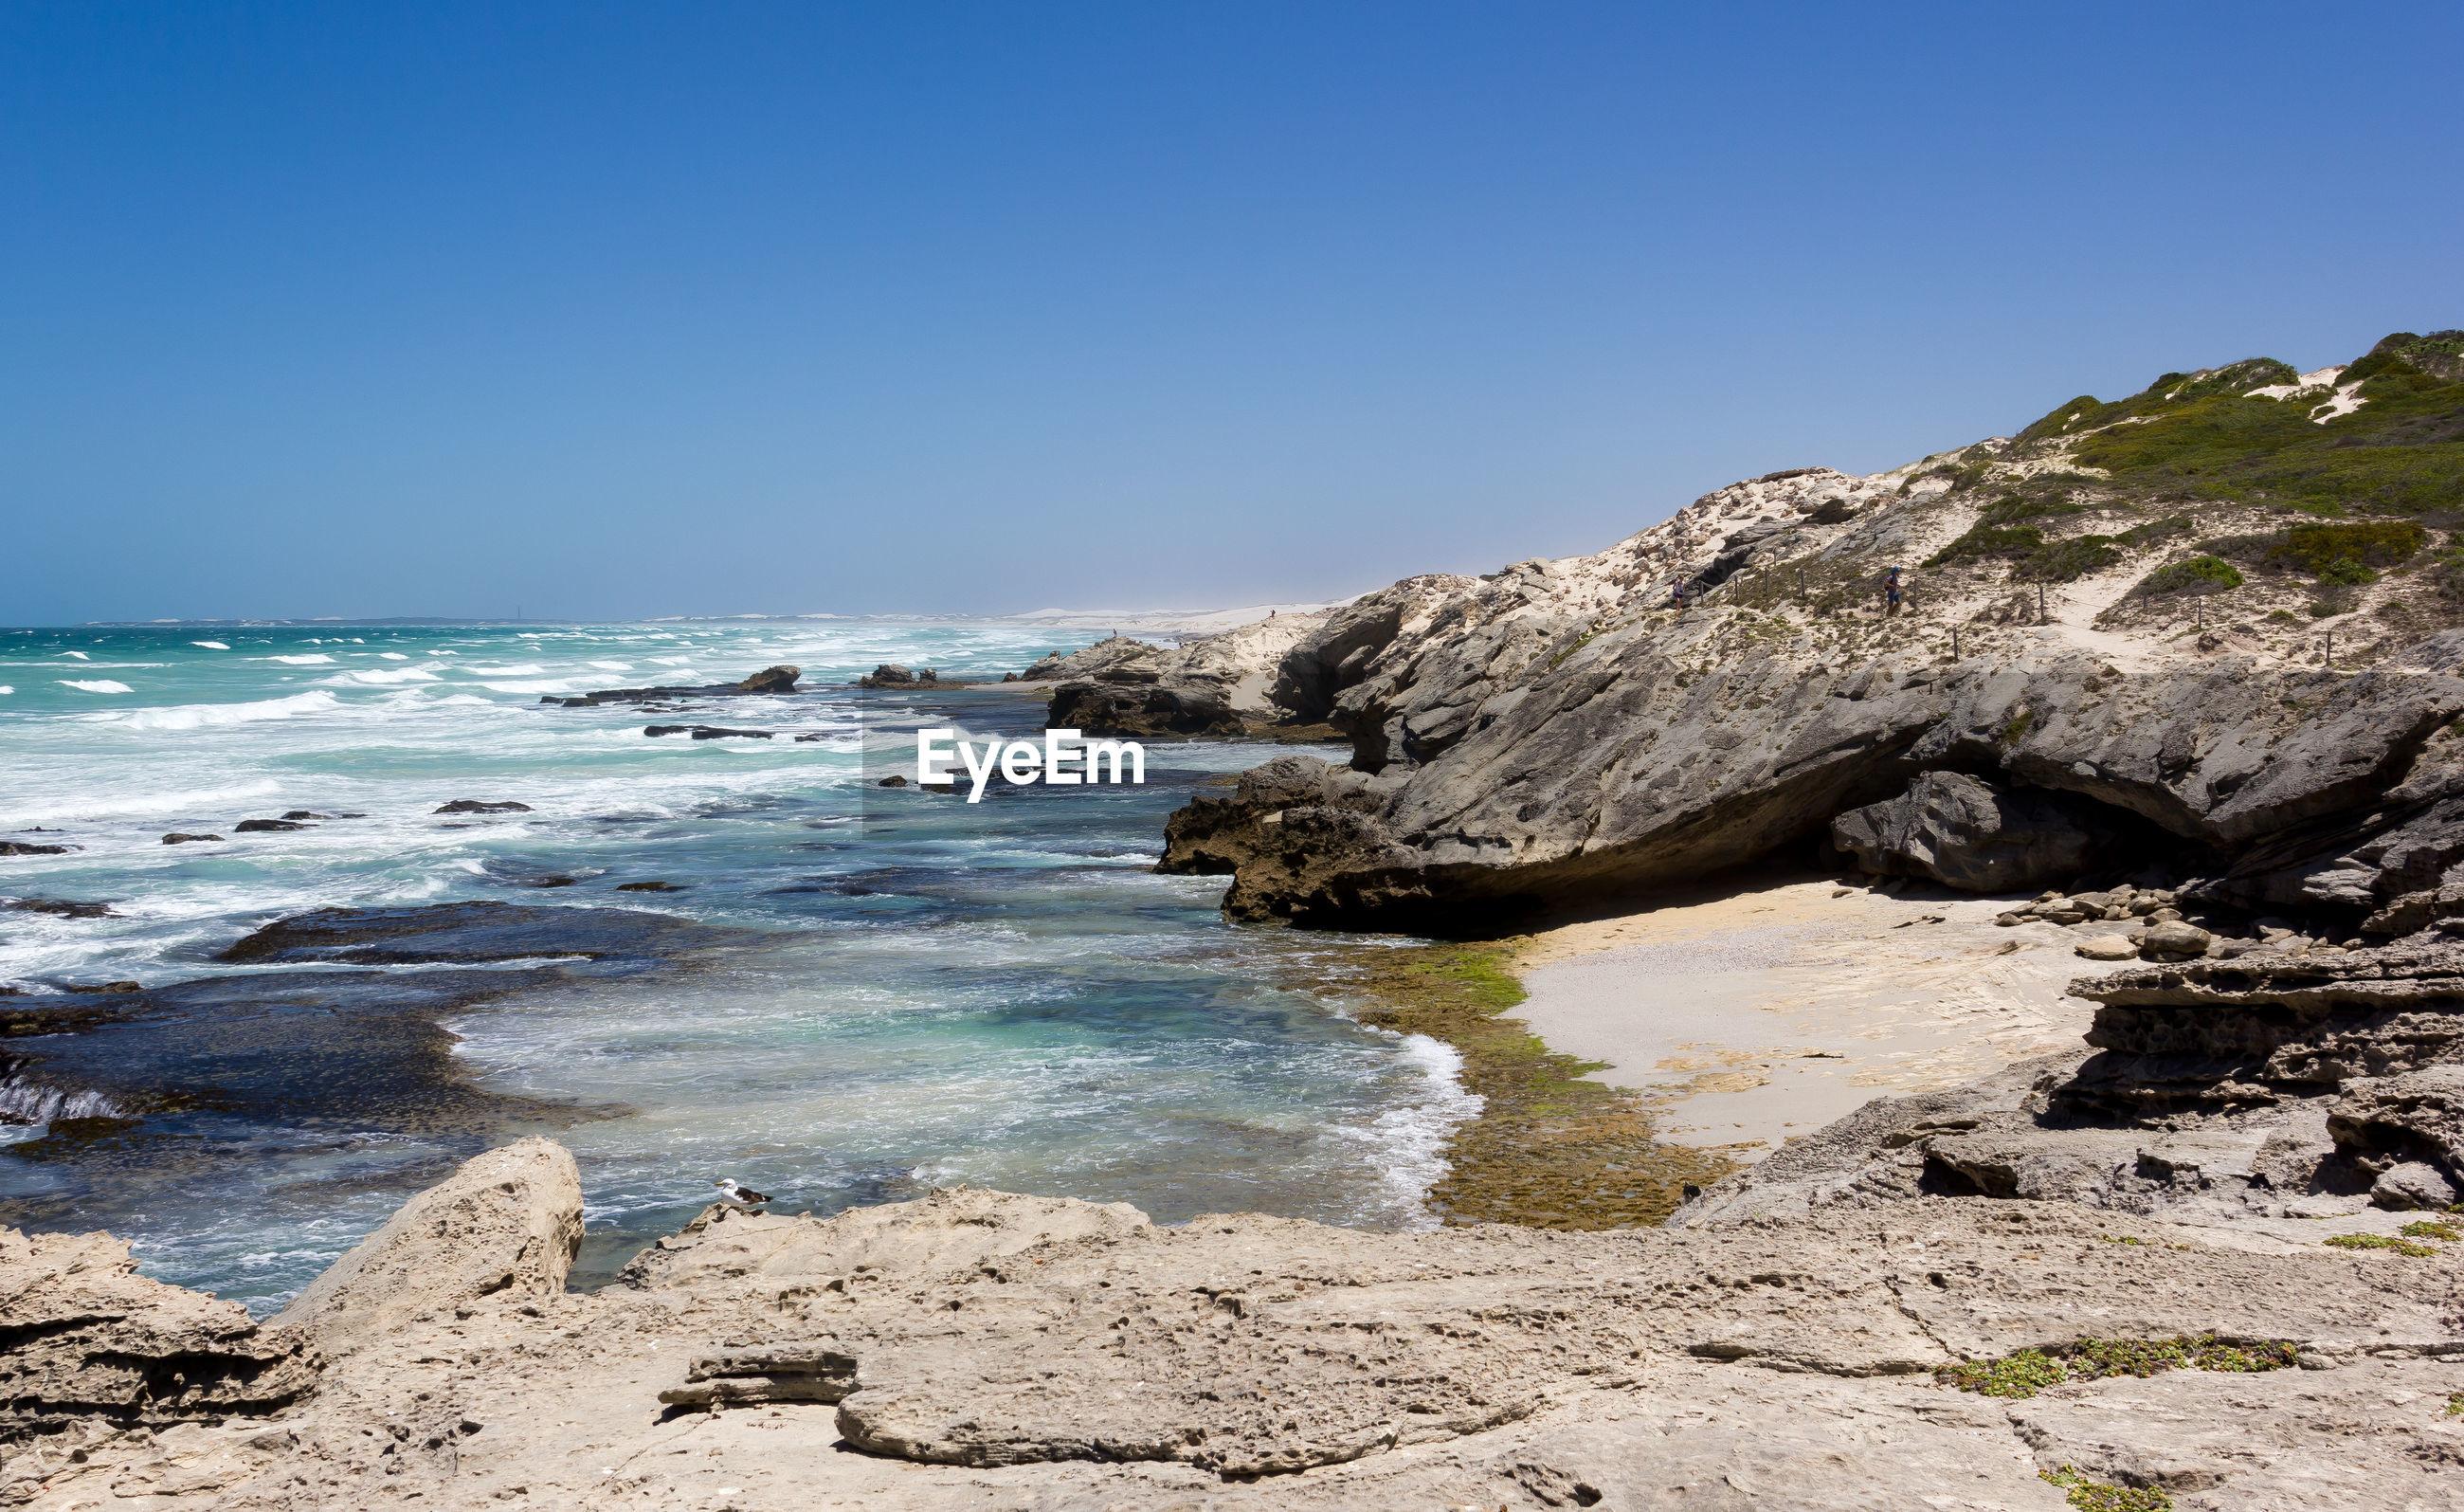 ROCKS ON SEA AGAINST CLEAR BLUE SKY